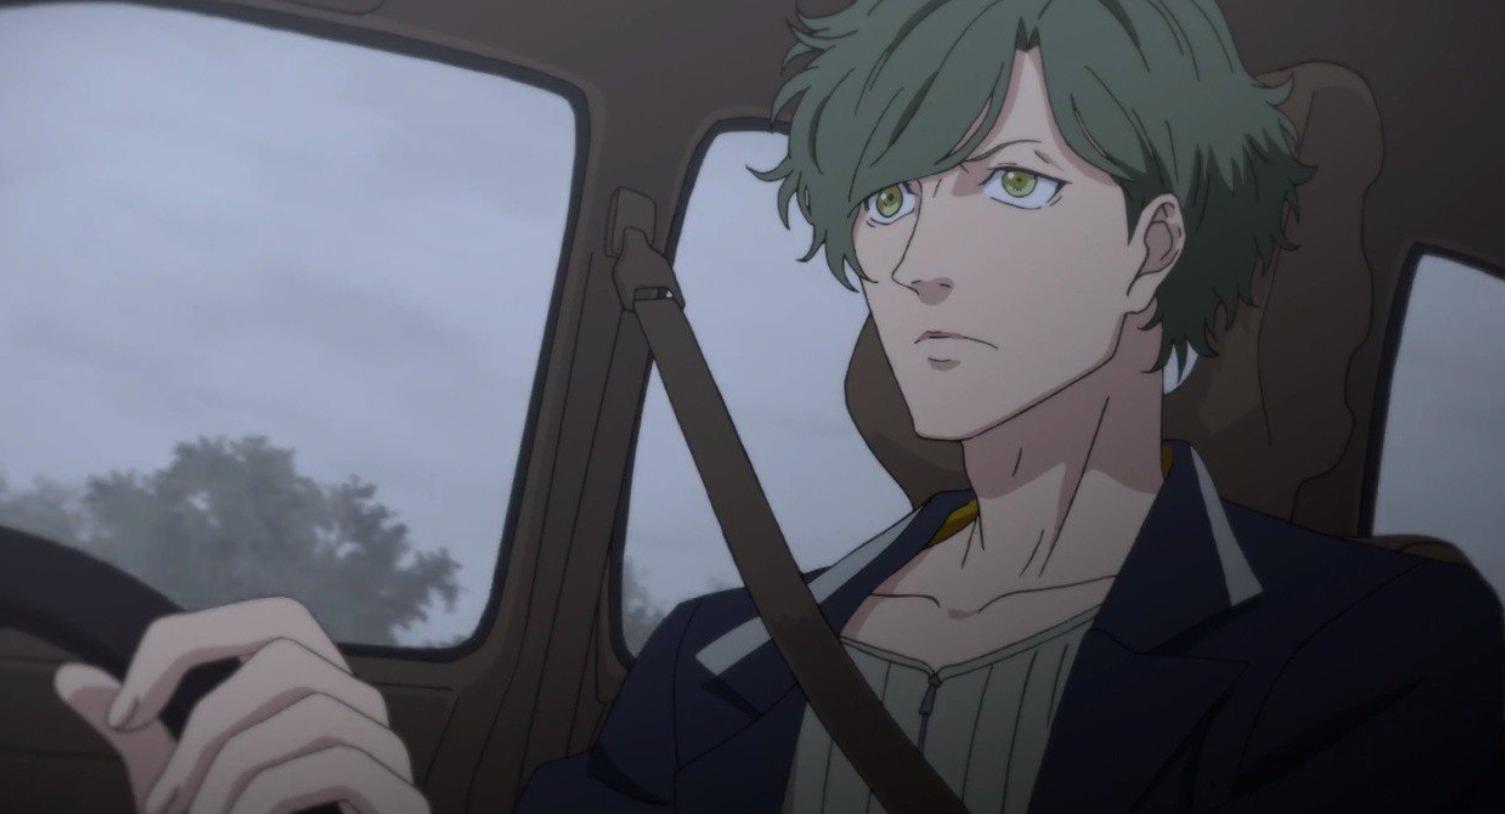 『HEROMASK』の第6話ネタバレ・あらすじ・感想